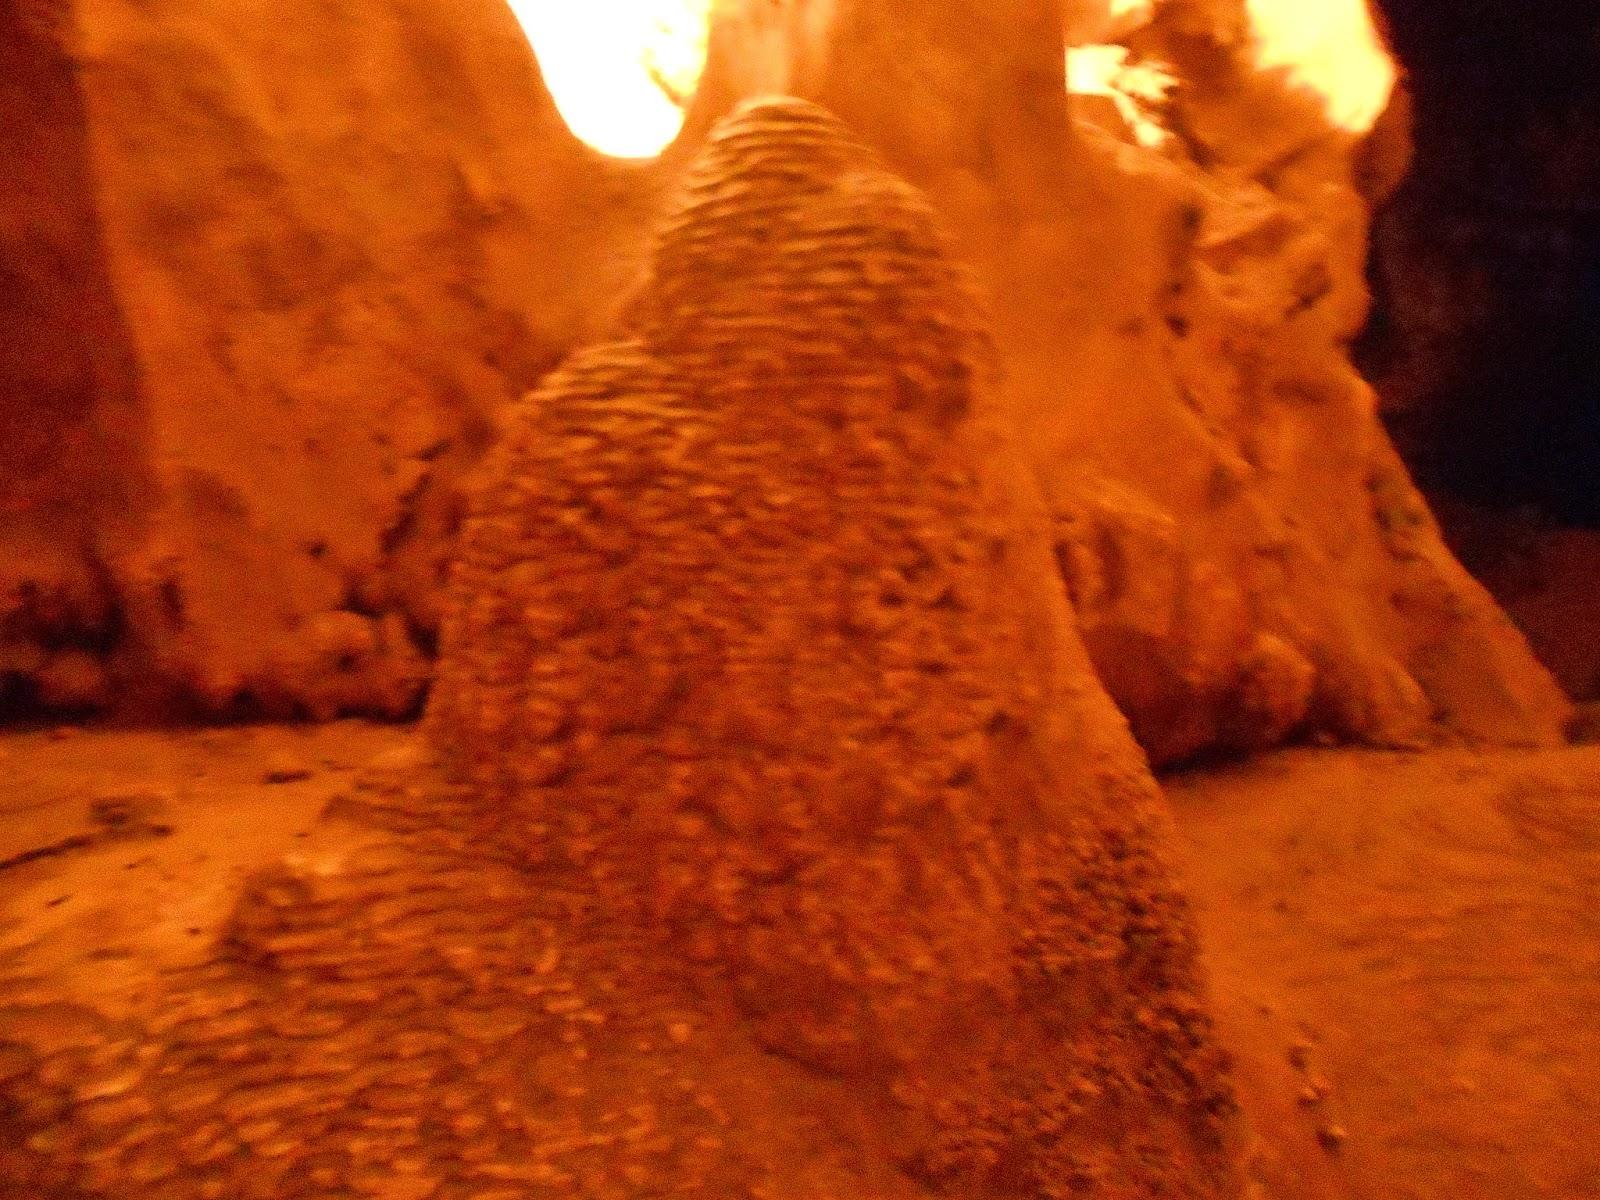 inside colossal cave tucson arizona cave tour